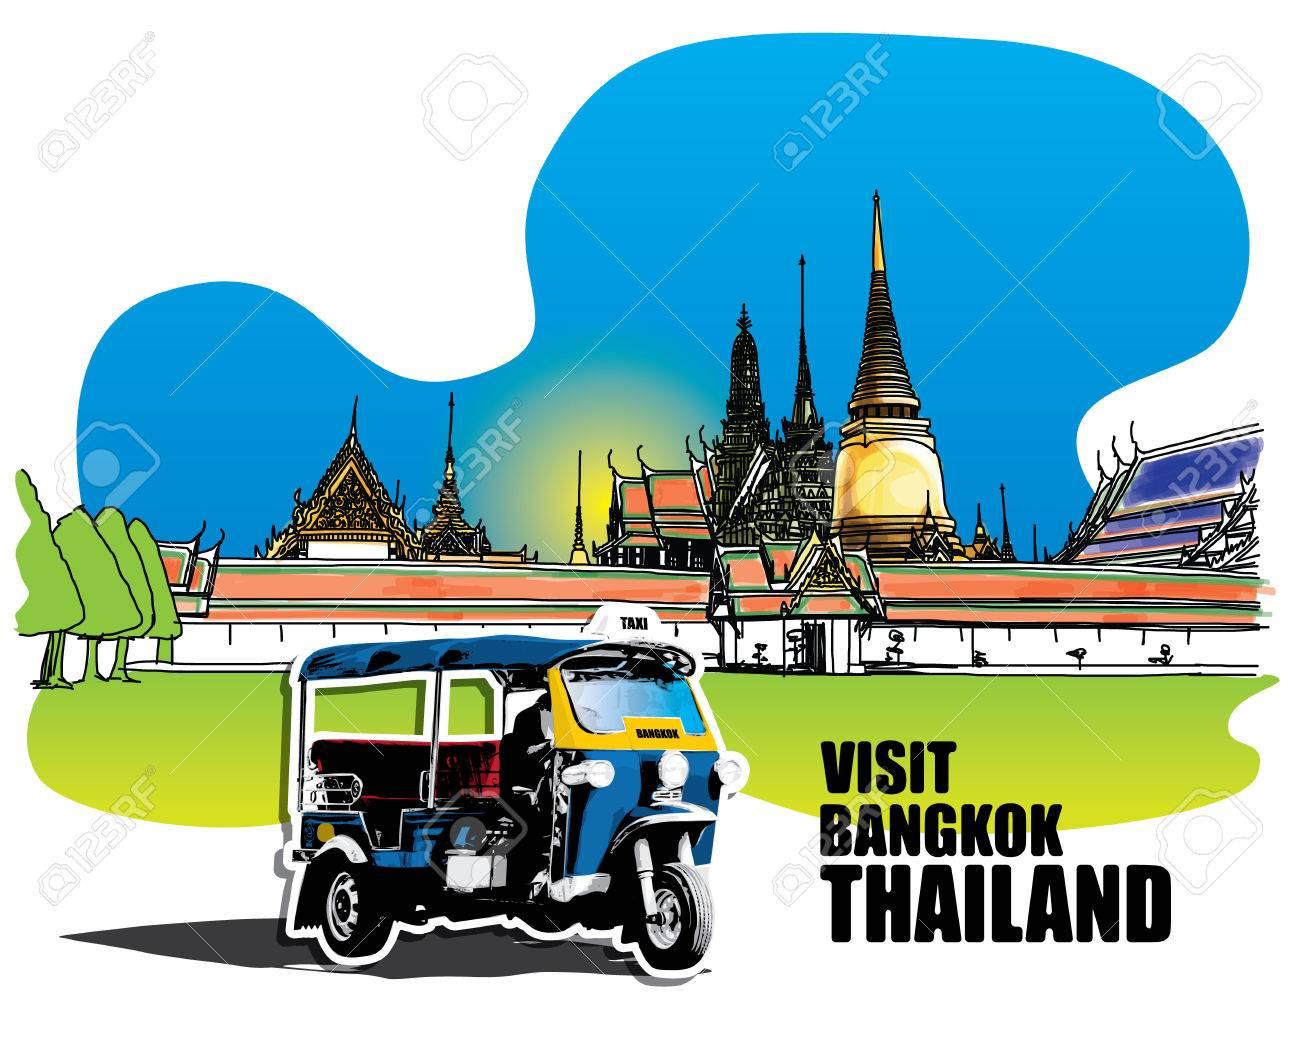 Tuk Tuk in front of Grand Palace - Wat Phra Kaew, Bangkok Thailand, Hand-Drawn - 43895912